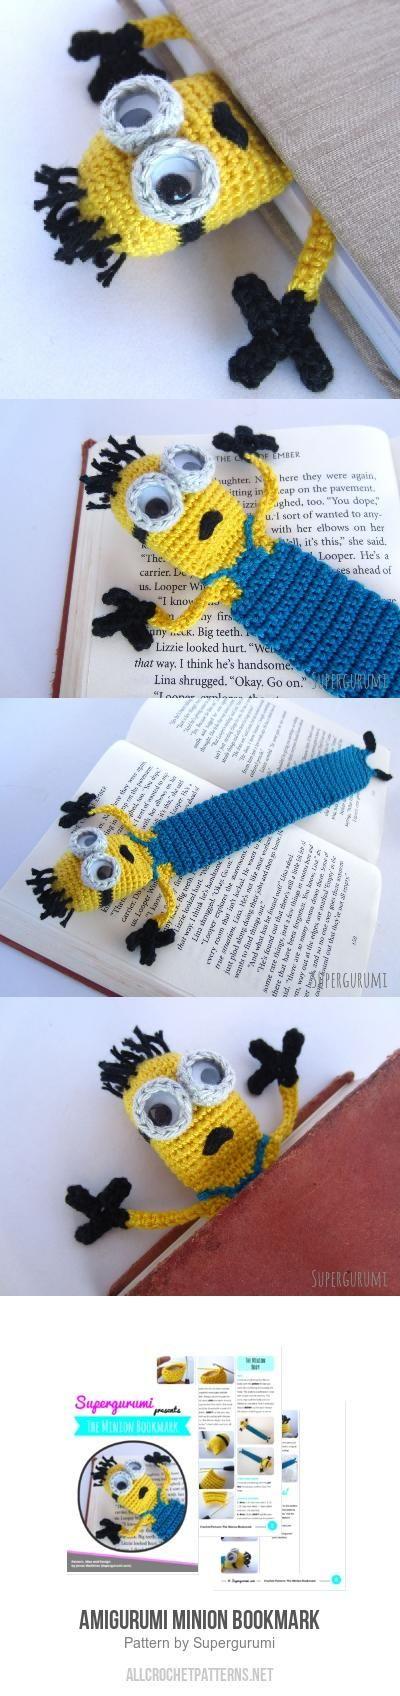 Amigurumi Minion Bookmark Crochet Pattern for purchase | amigurumis ...